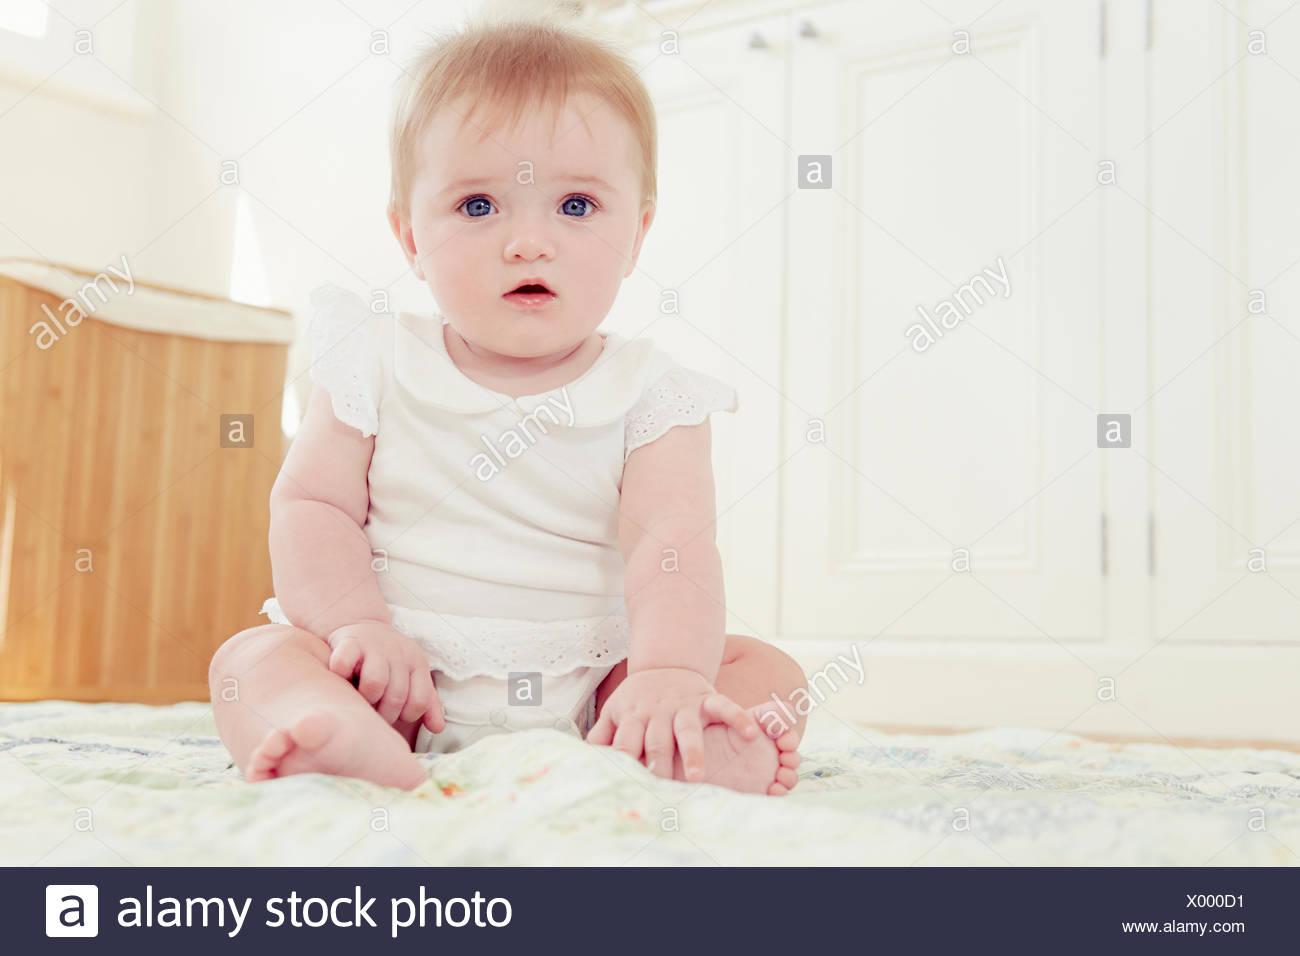 Portrait baby girl sitting on floor - Stock Image